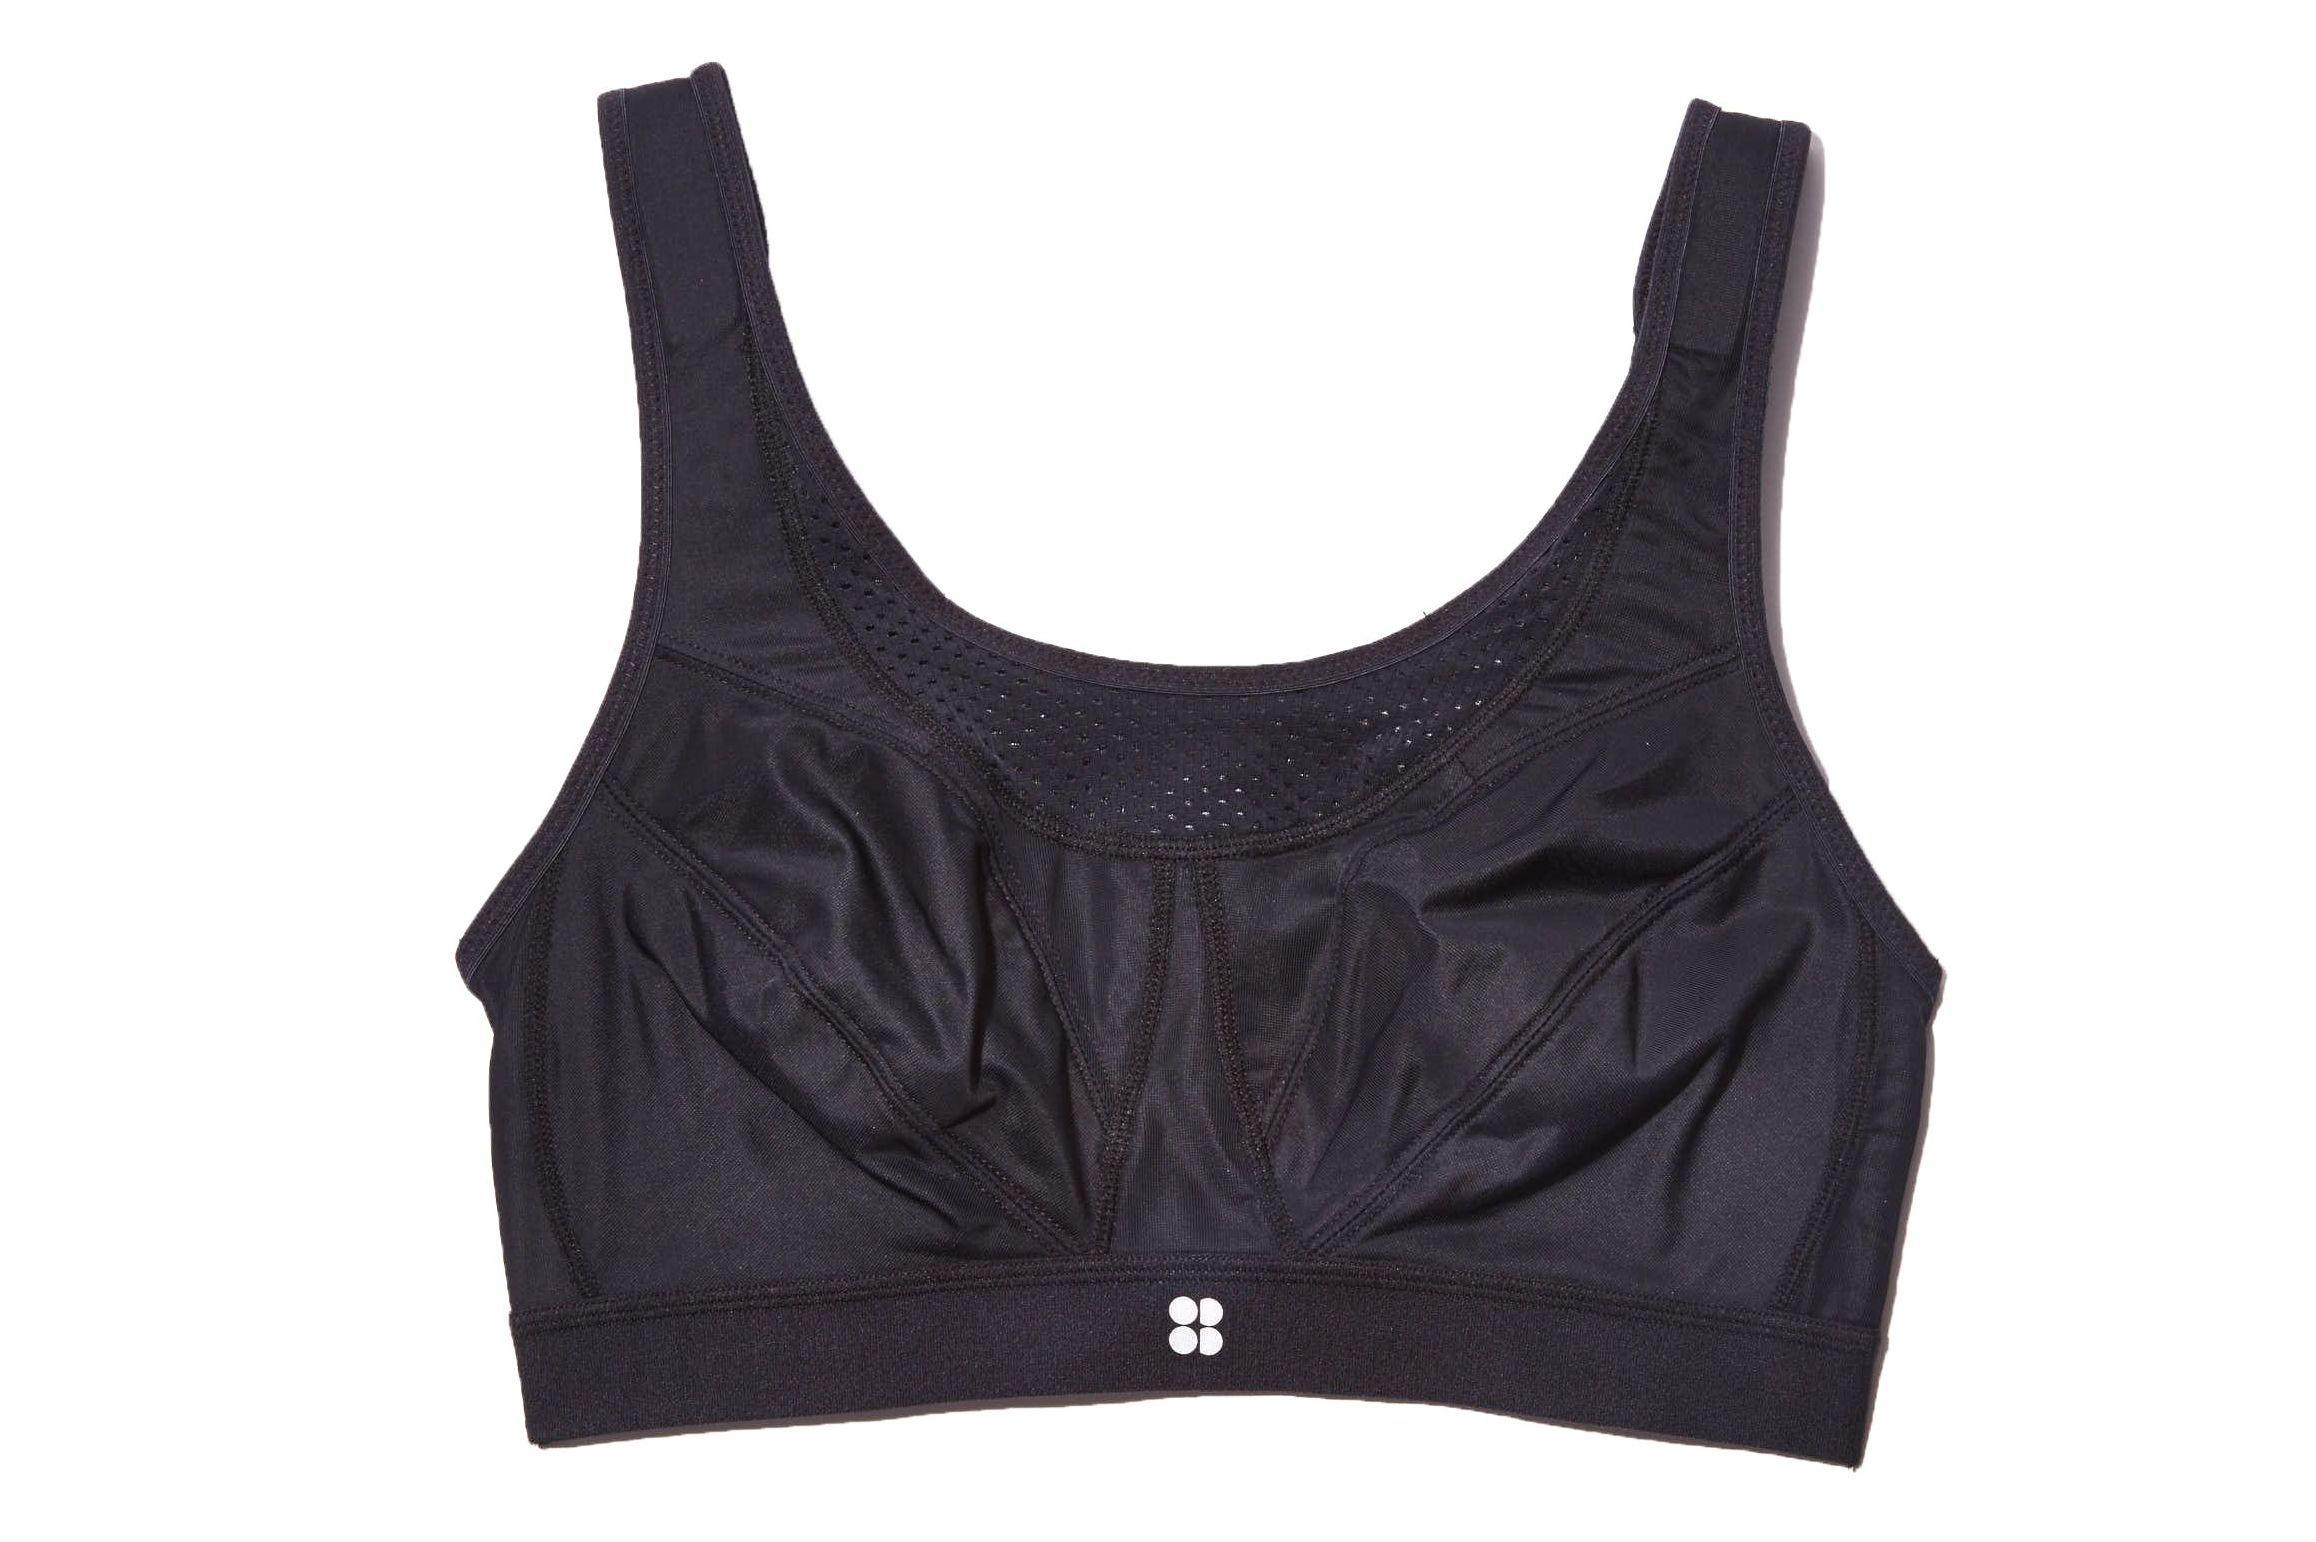 Ultra Run Sports Bra Supportive sports bras, Best sports